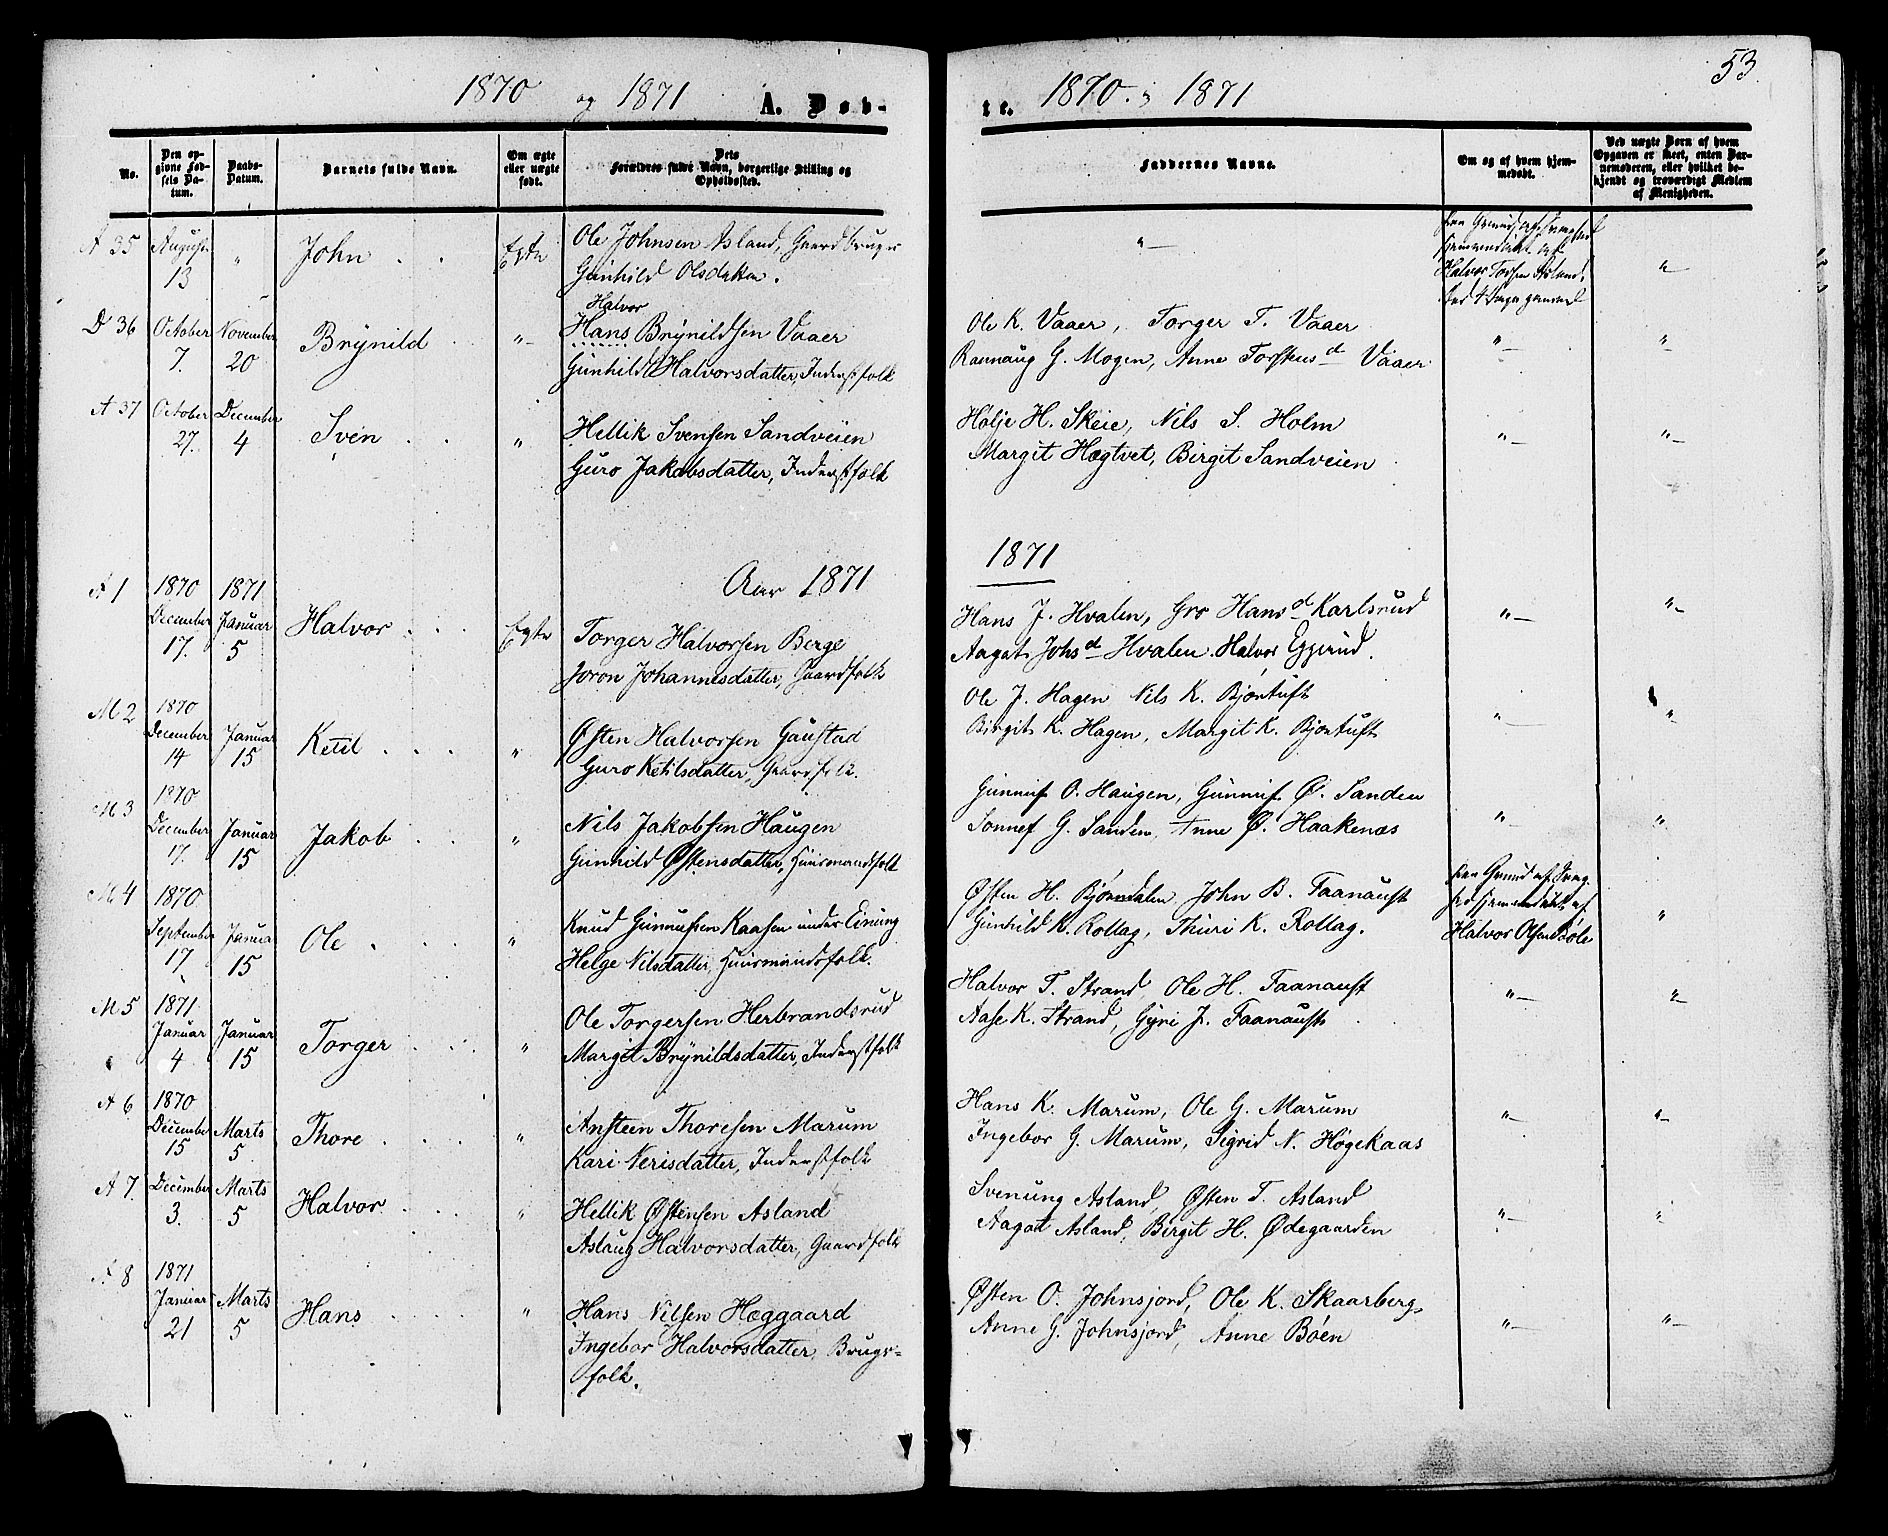 SAKO, Tinn kirkebøker, F/Fa/L0006: Ministerialbok nr. I 6, 1857-1878, s. 53